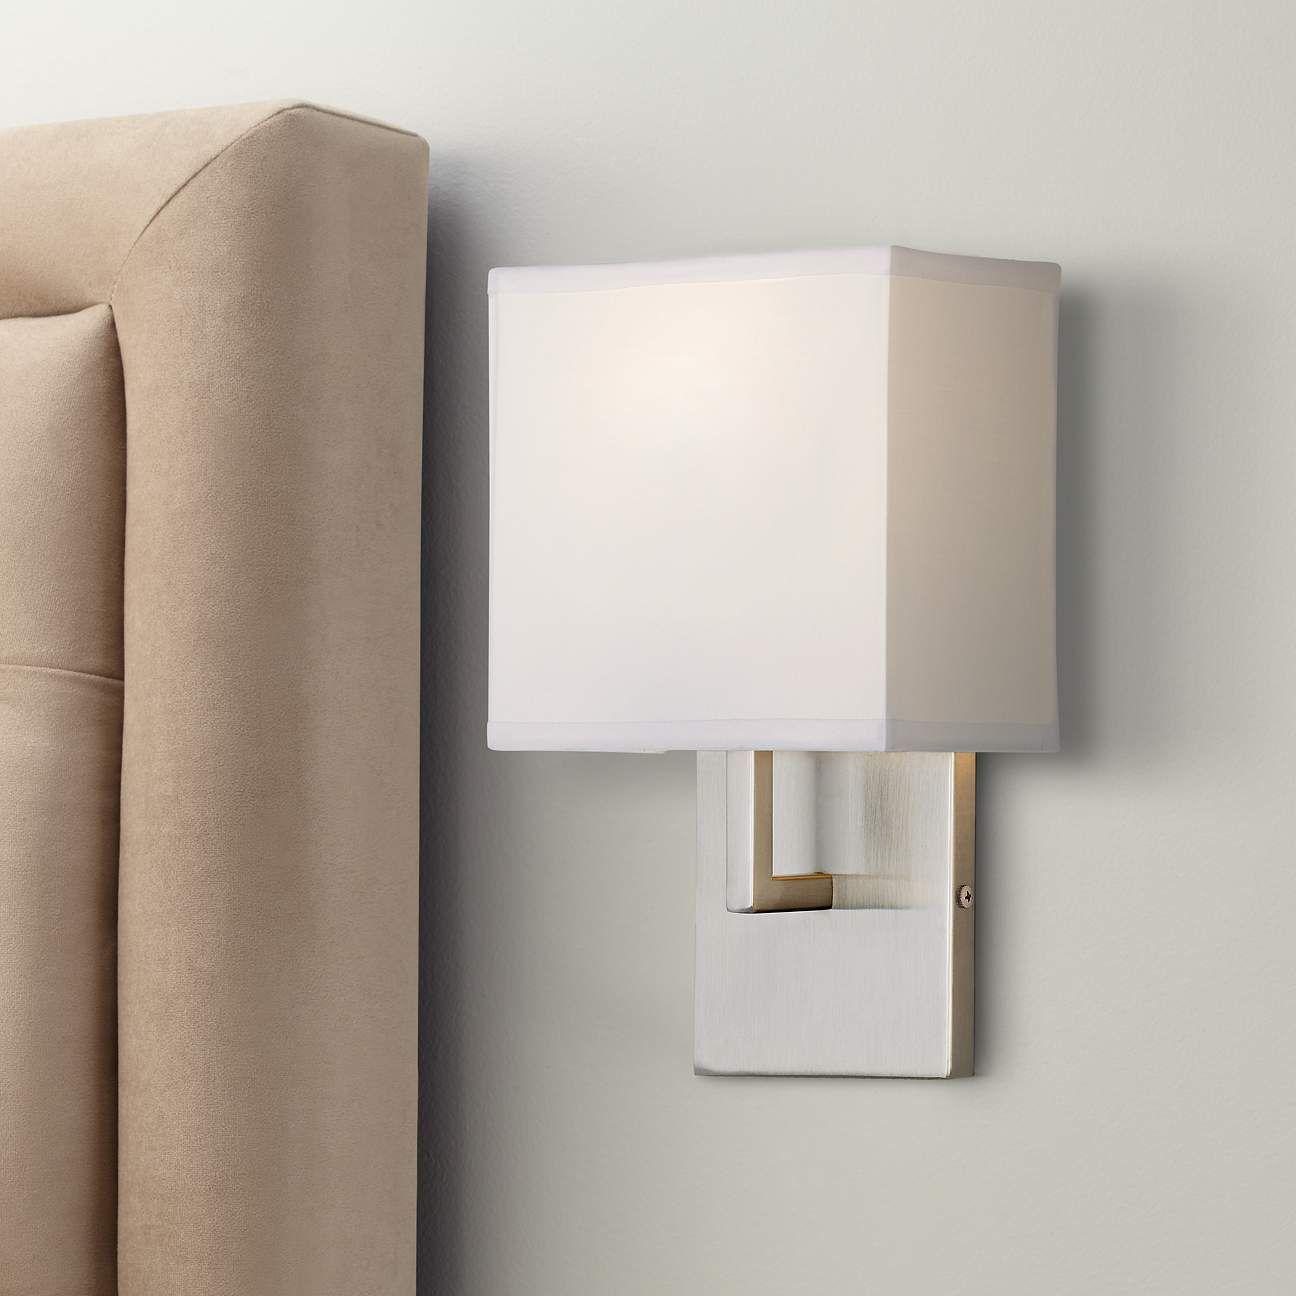 George Kovacs Saber 12 1 2 High Honey Gold Wall Sconce Y4449 Lamps Plus In 2021 Gold Wall Sconce Sconces Bathroom Wall Sconces